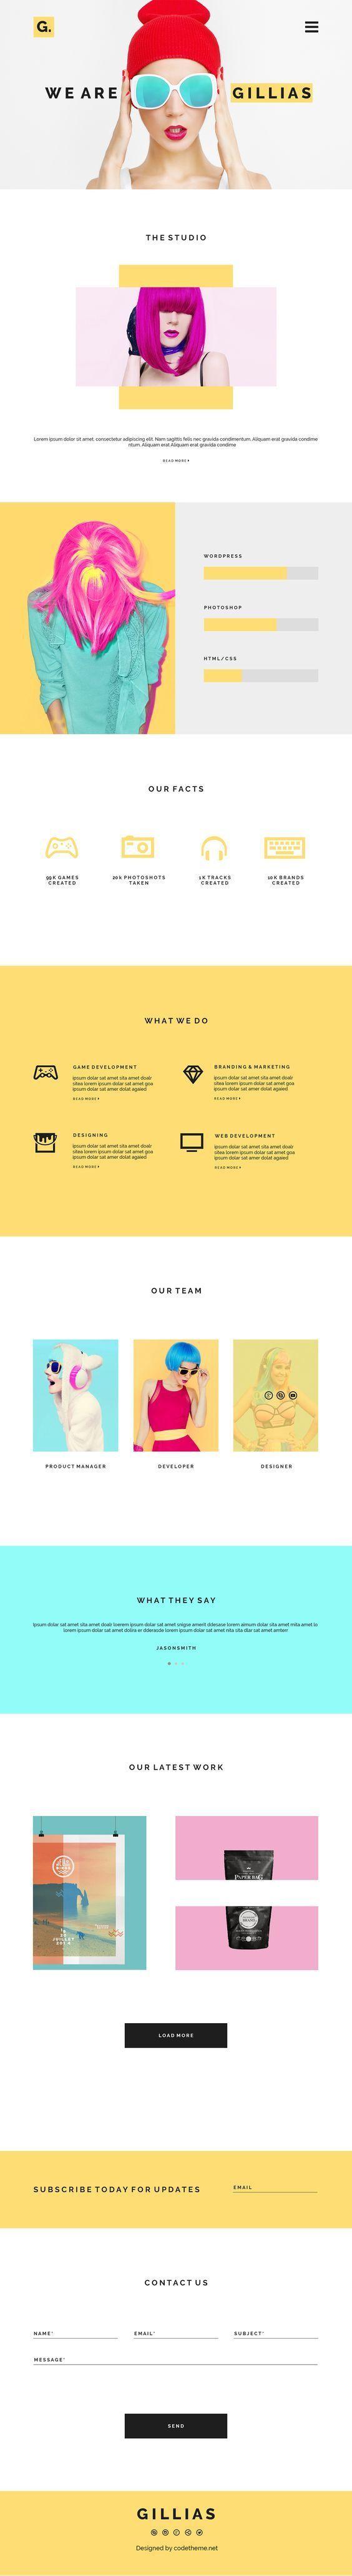 Gillias Agency Web Design by Daniel Pervaiz                                                                                                                                                                                 More